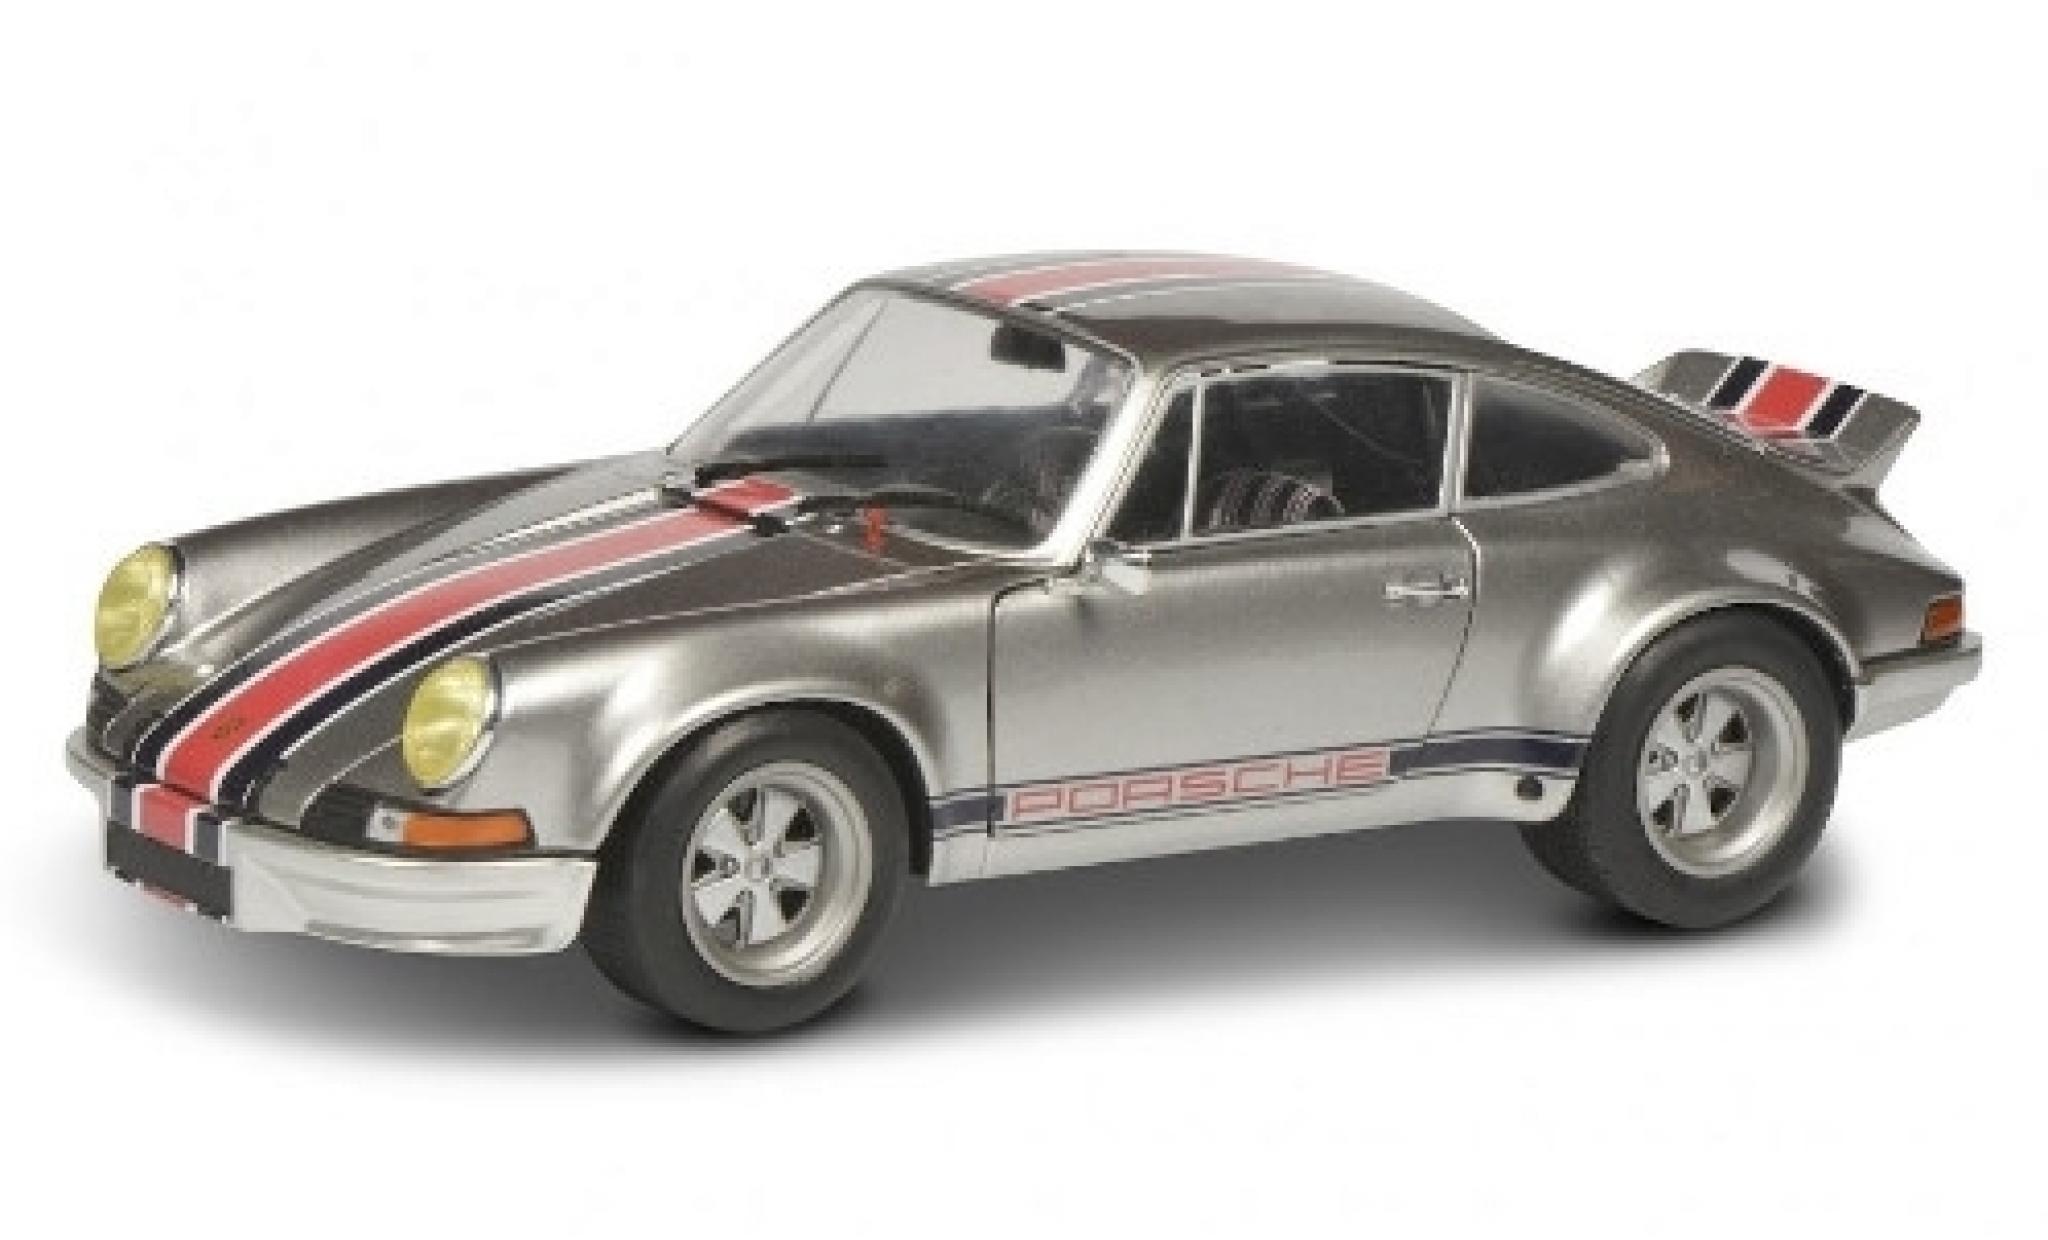 Porsche 911 1/18 Solido Carrera RSR grey/Dekor